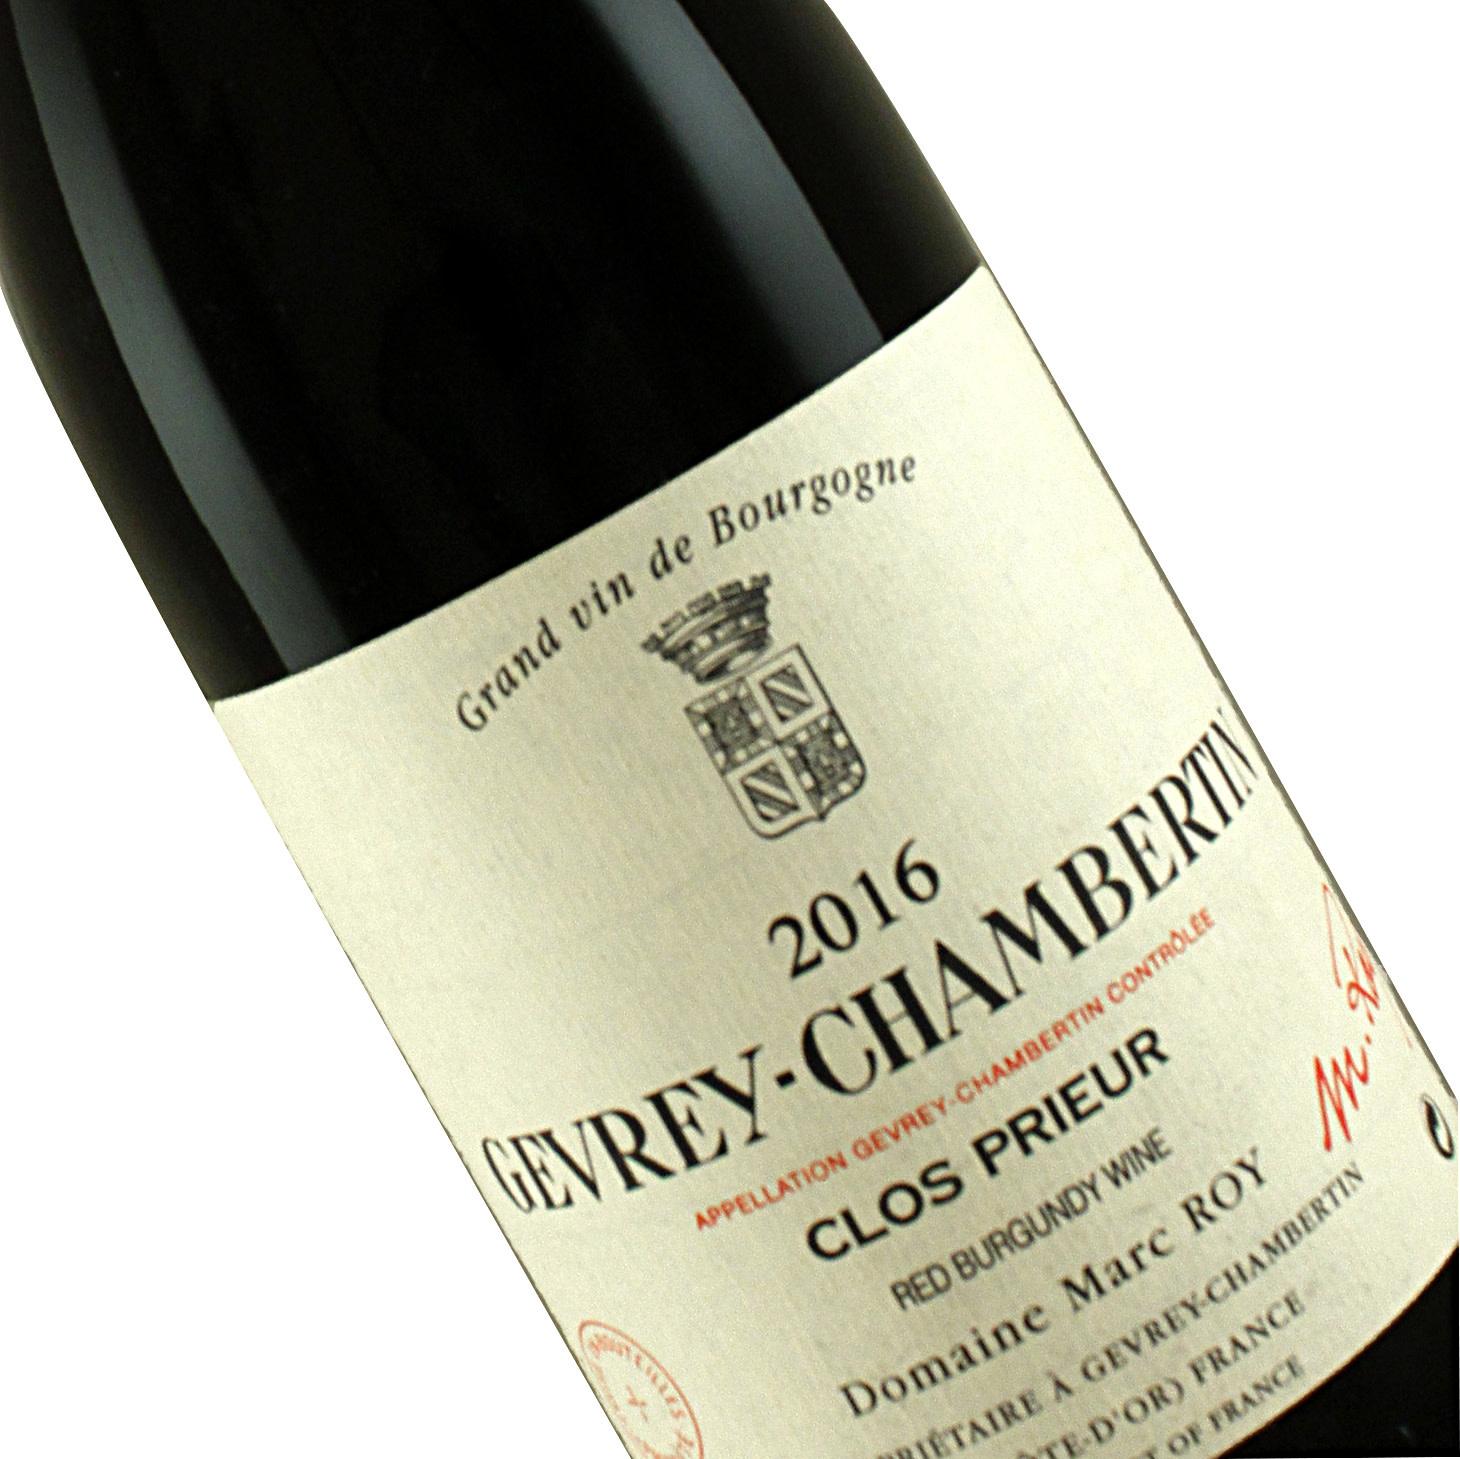 Domaine Marc Roy 2016 Gevrey-Chambertin Clos Prieur, Burgundy